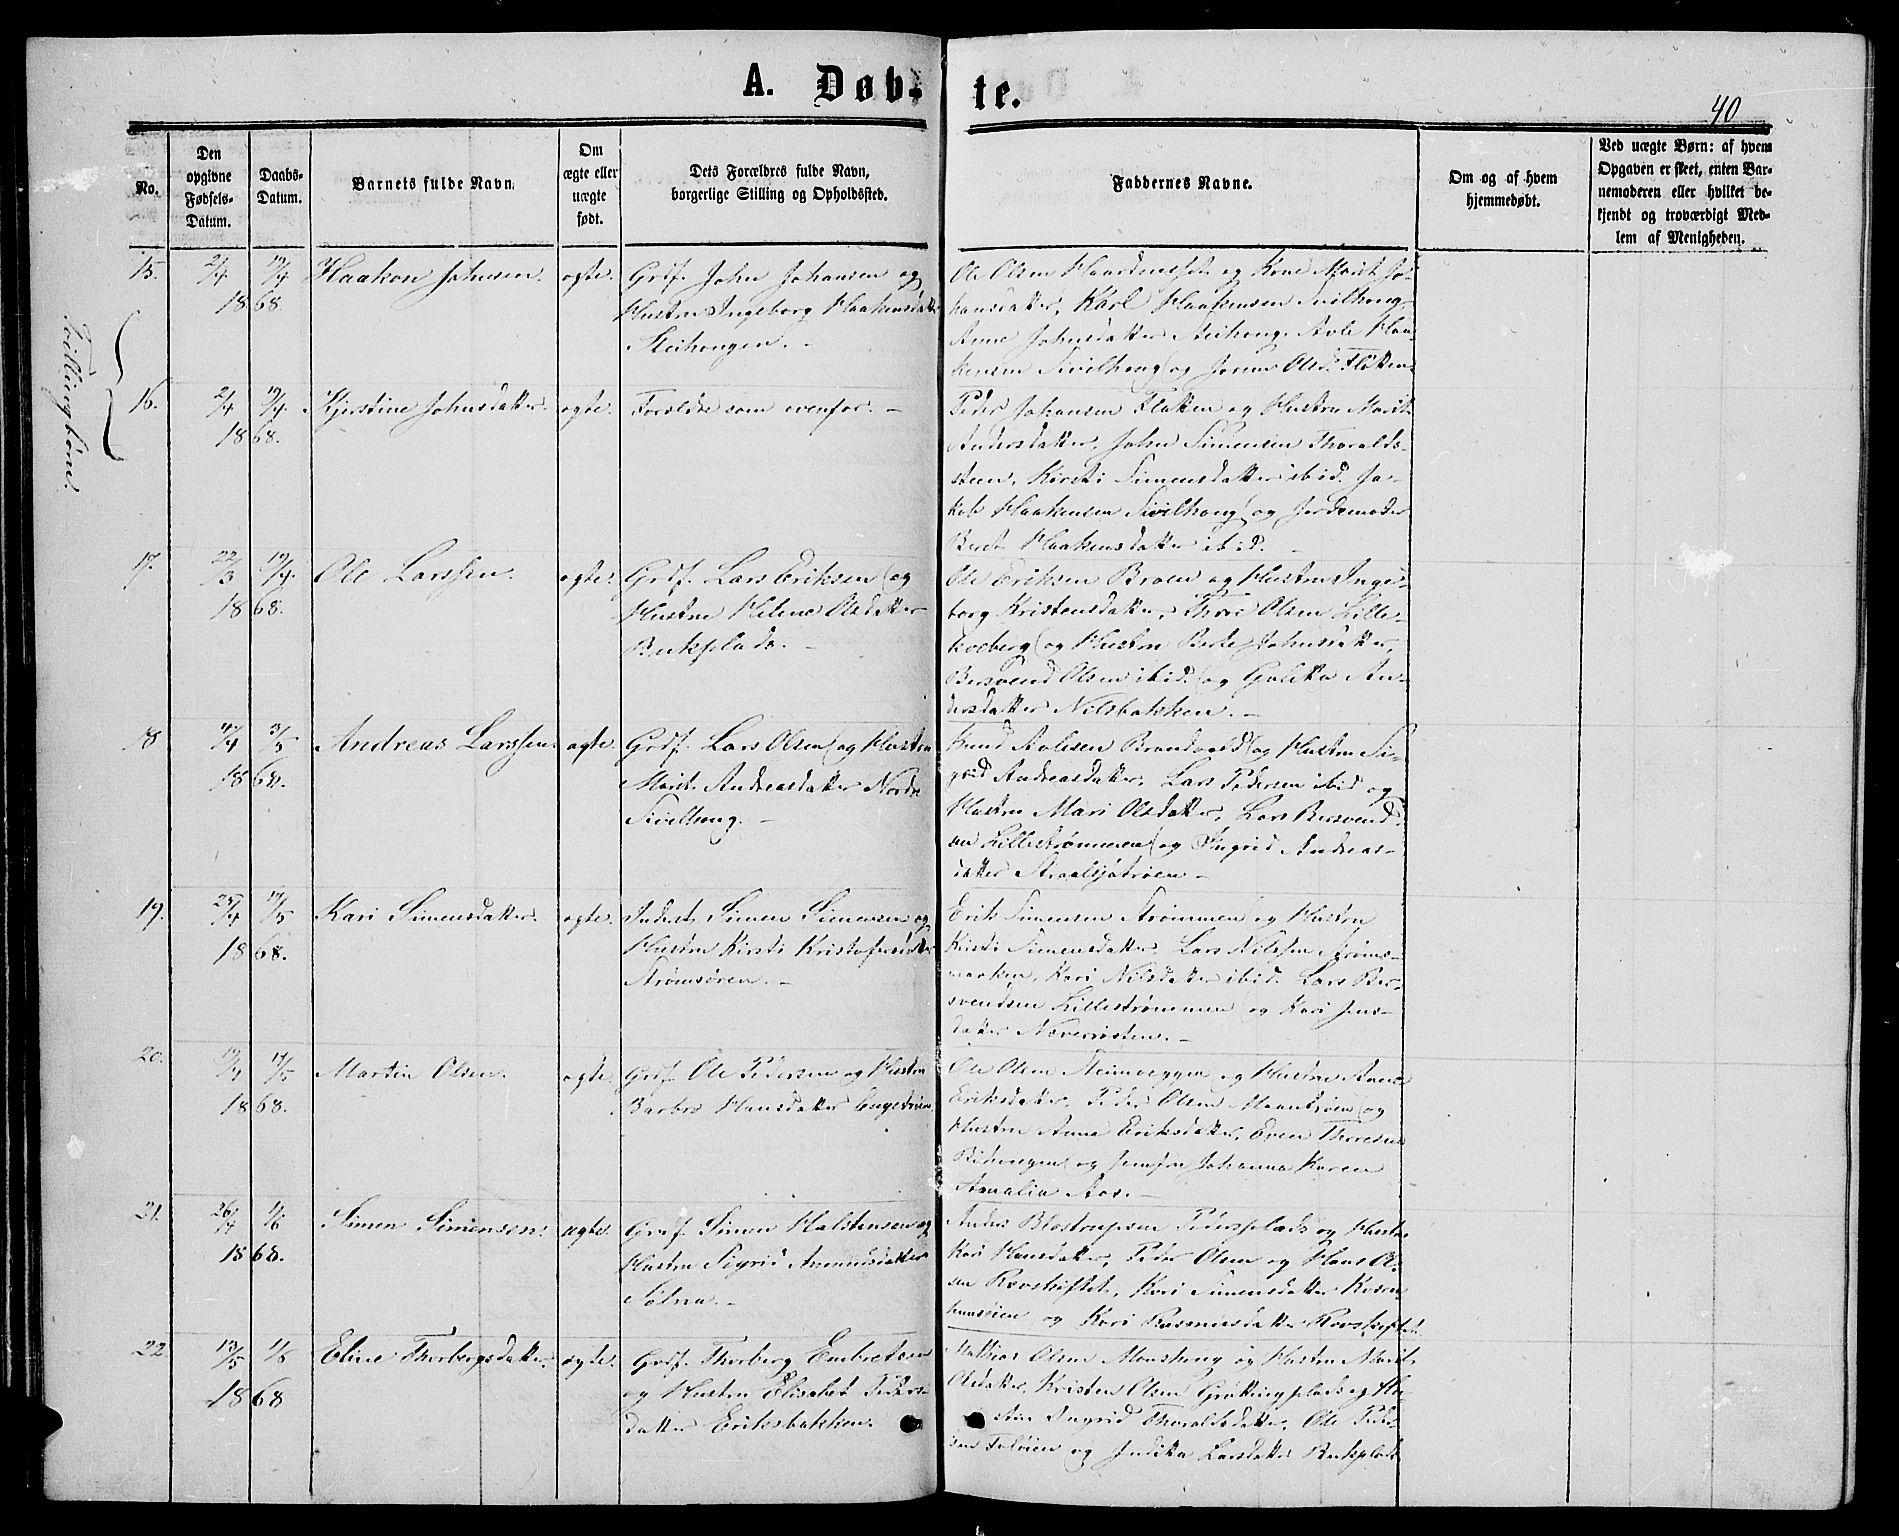 SAH, Alvdal prestekontor, Klokkerbok nr. 2, 1863-1878, s. 40